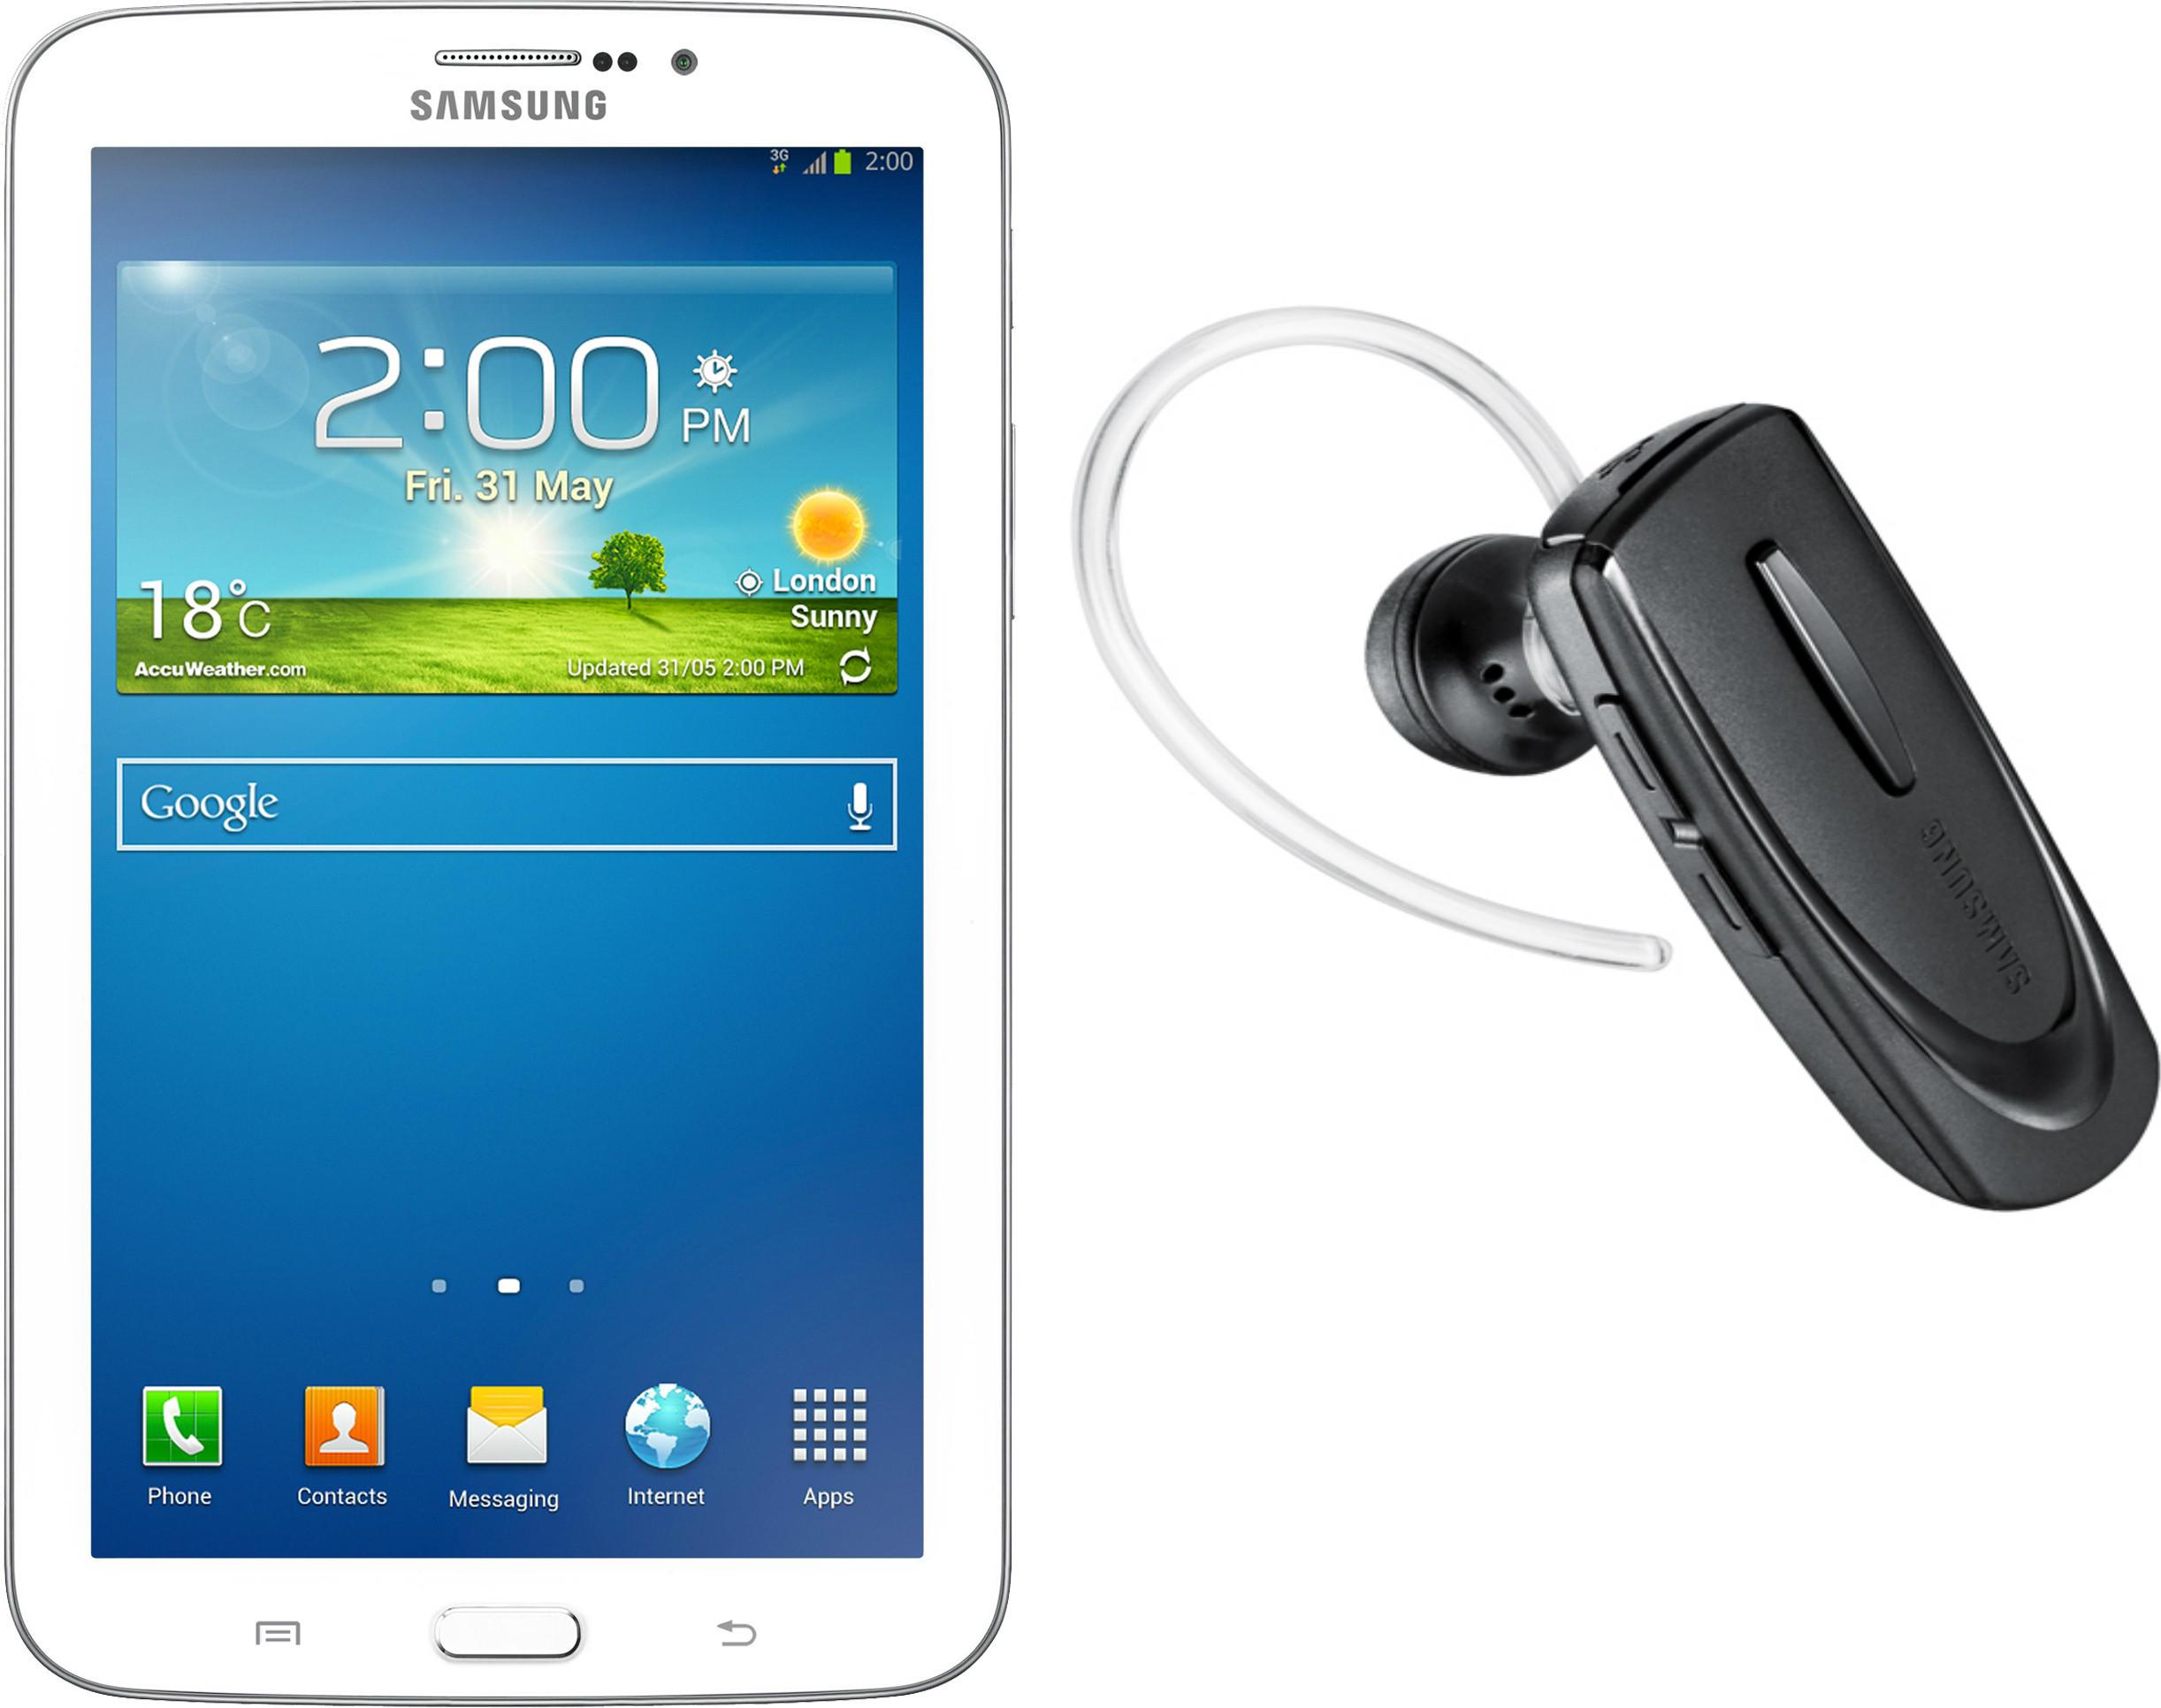 Samsung Galaxy Tab 3 T211 Tablet White, 8 GB, Wi-Fi, 3G, Bluetooth Headset